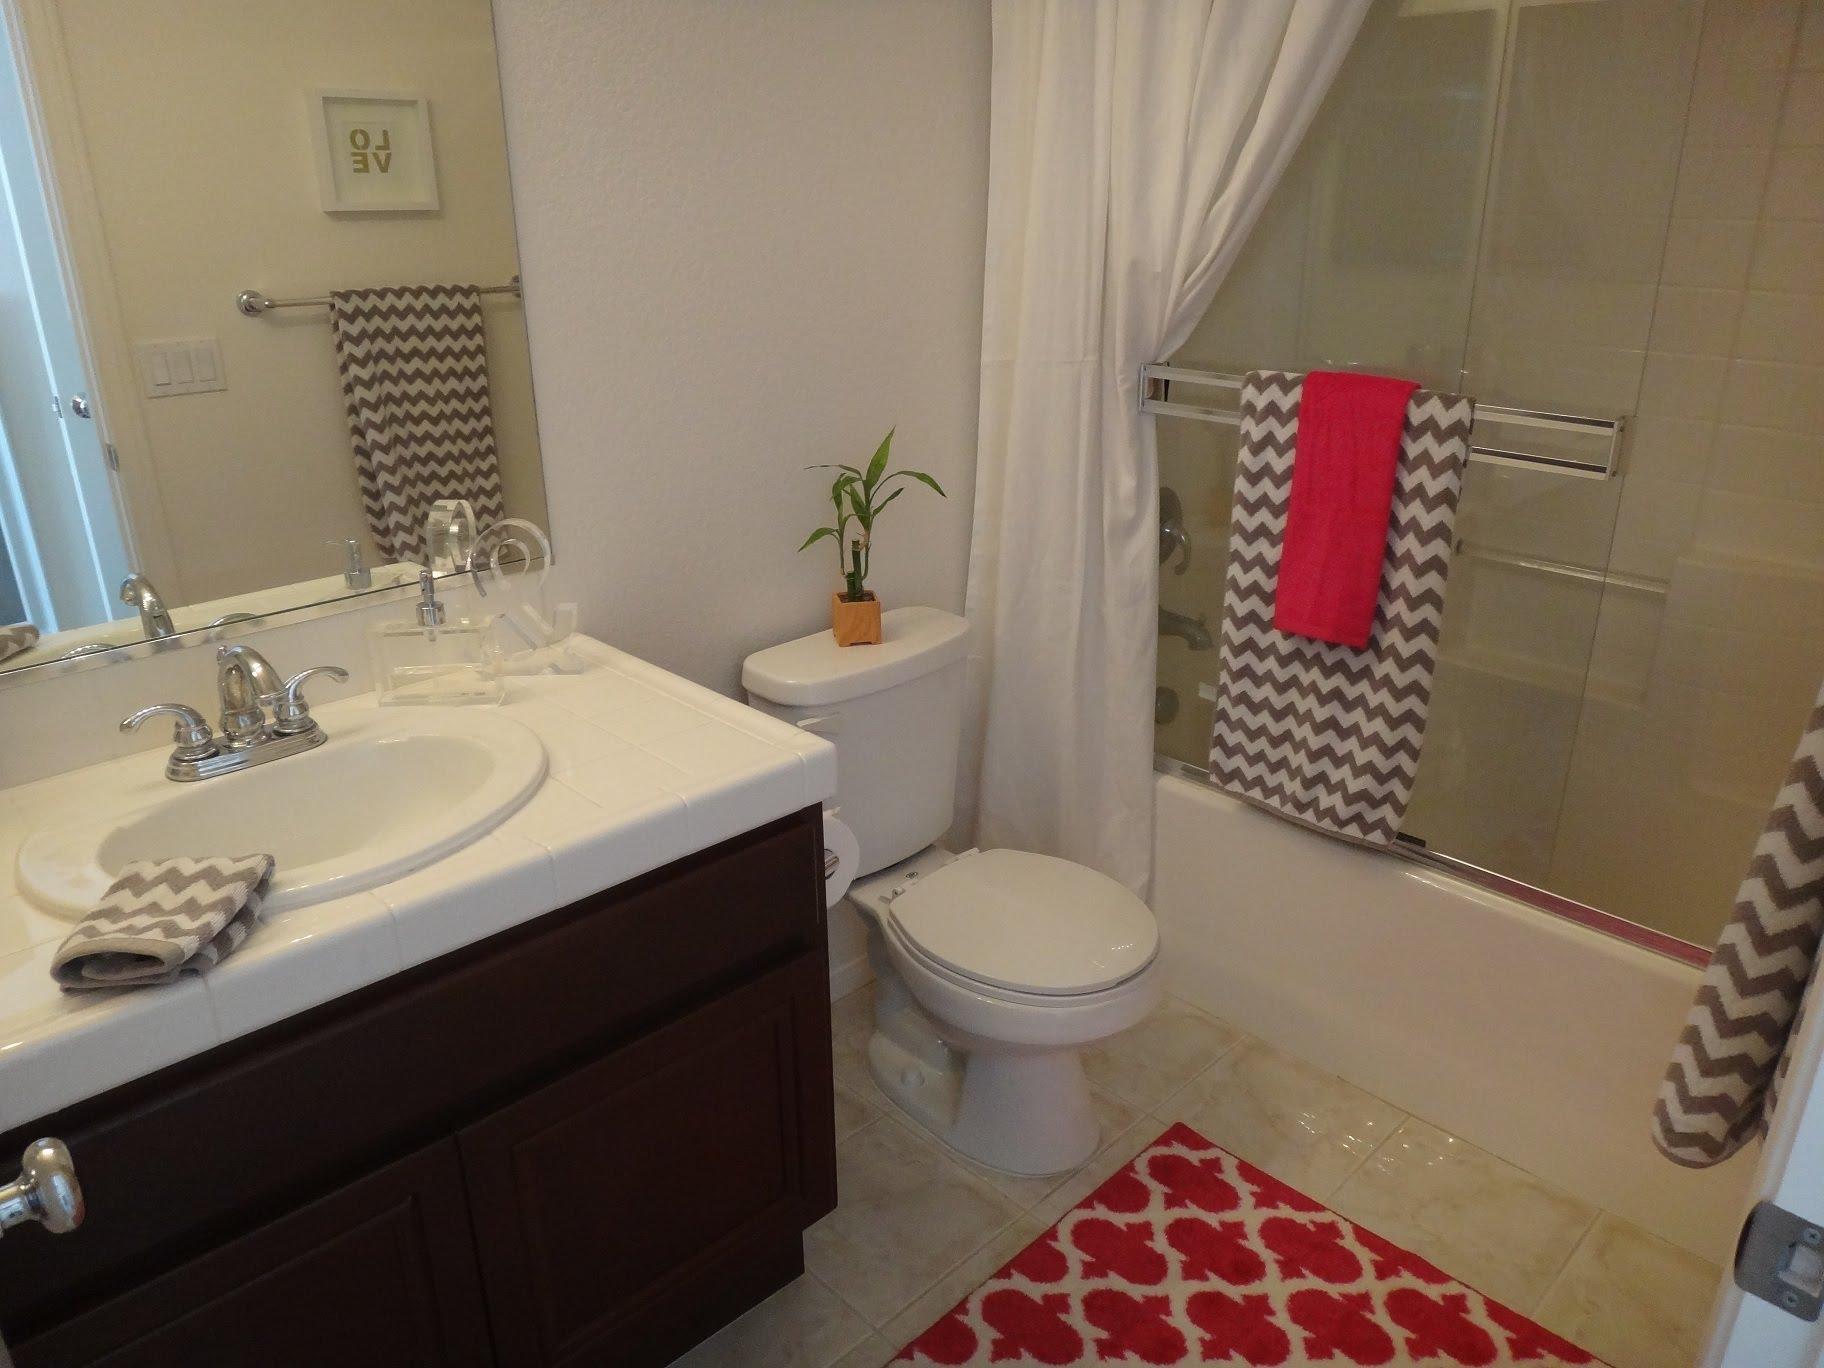 Bathroom decor girlu0027s bathroom decor - tour and organization - youtube BFOIXFV